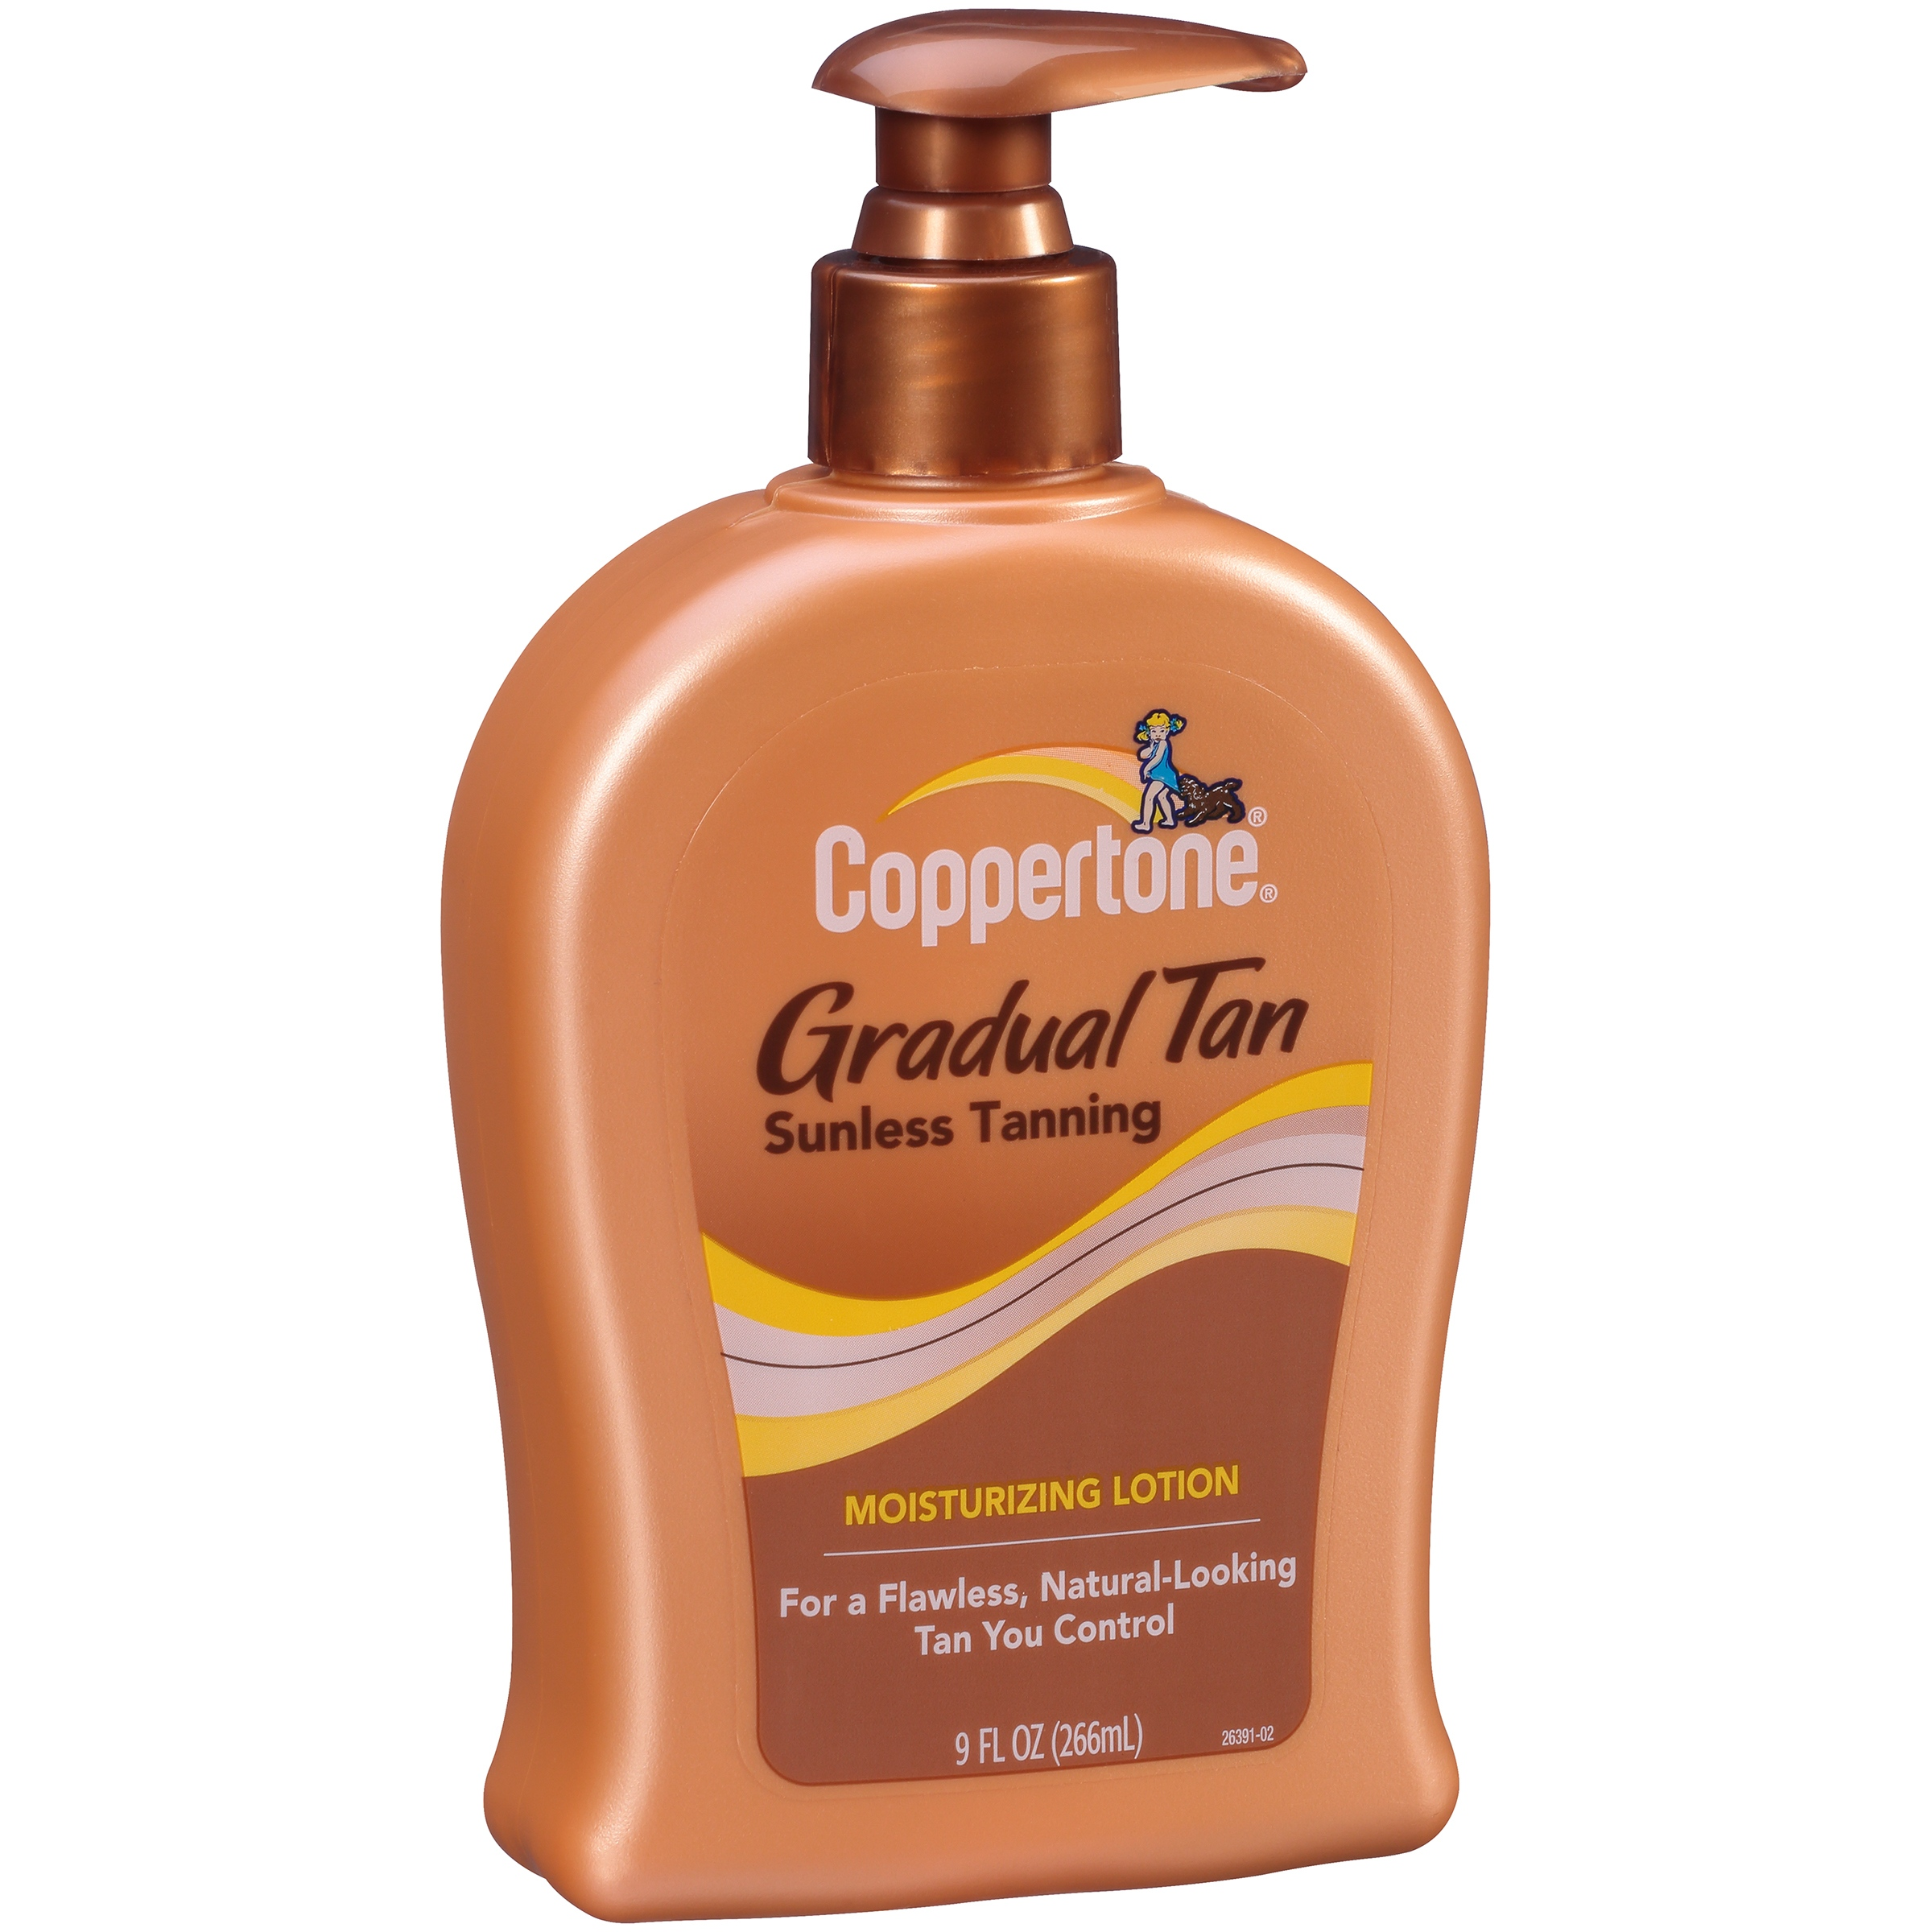 Coppertone Gradual Tan Sunless Tanning Moisturizing Lotion, 9 fl oz